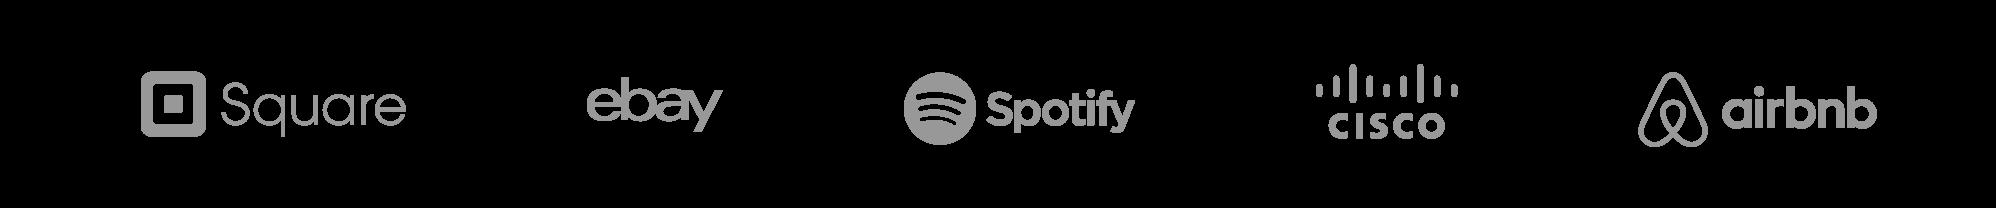 JIRA Customers: Square, Ebay, Spotify, Cisco, Airbnb